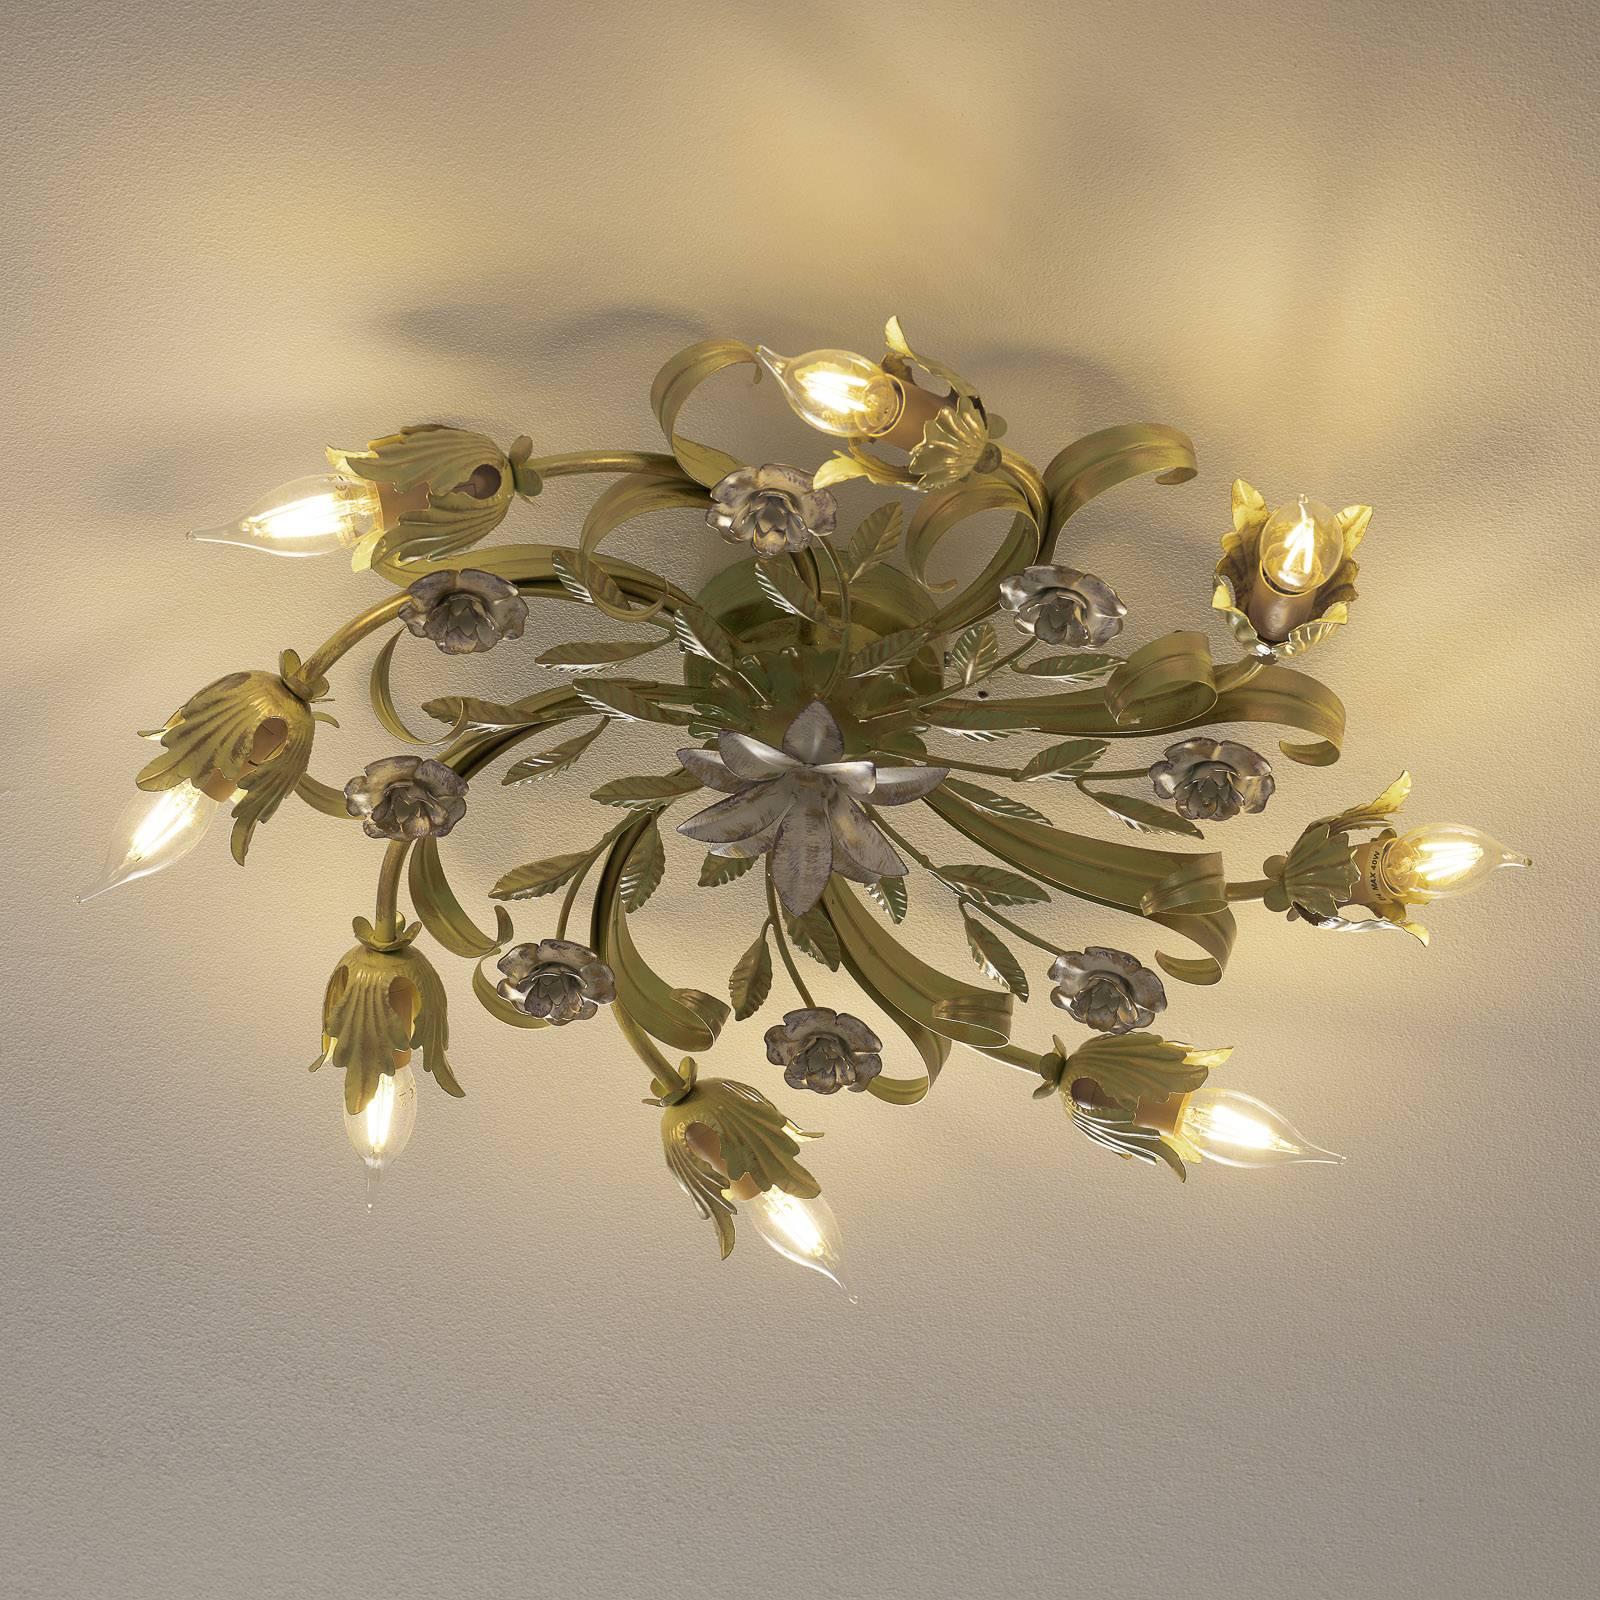 Florentijnse plafondlamp Tulipe, 8-lamps rond